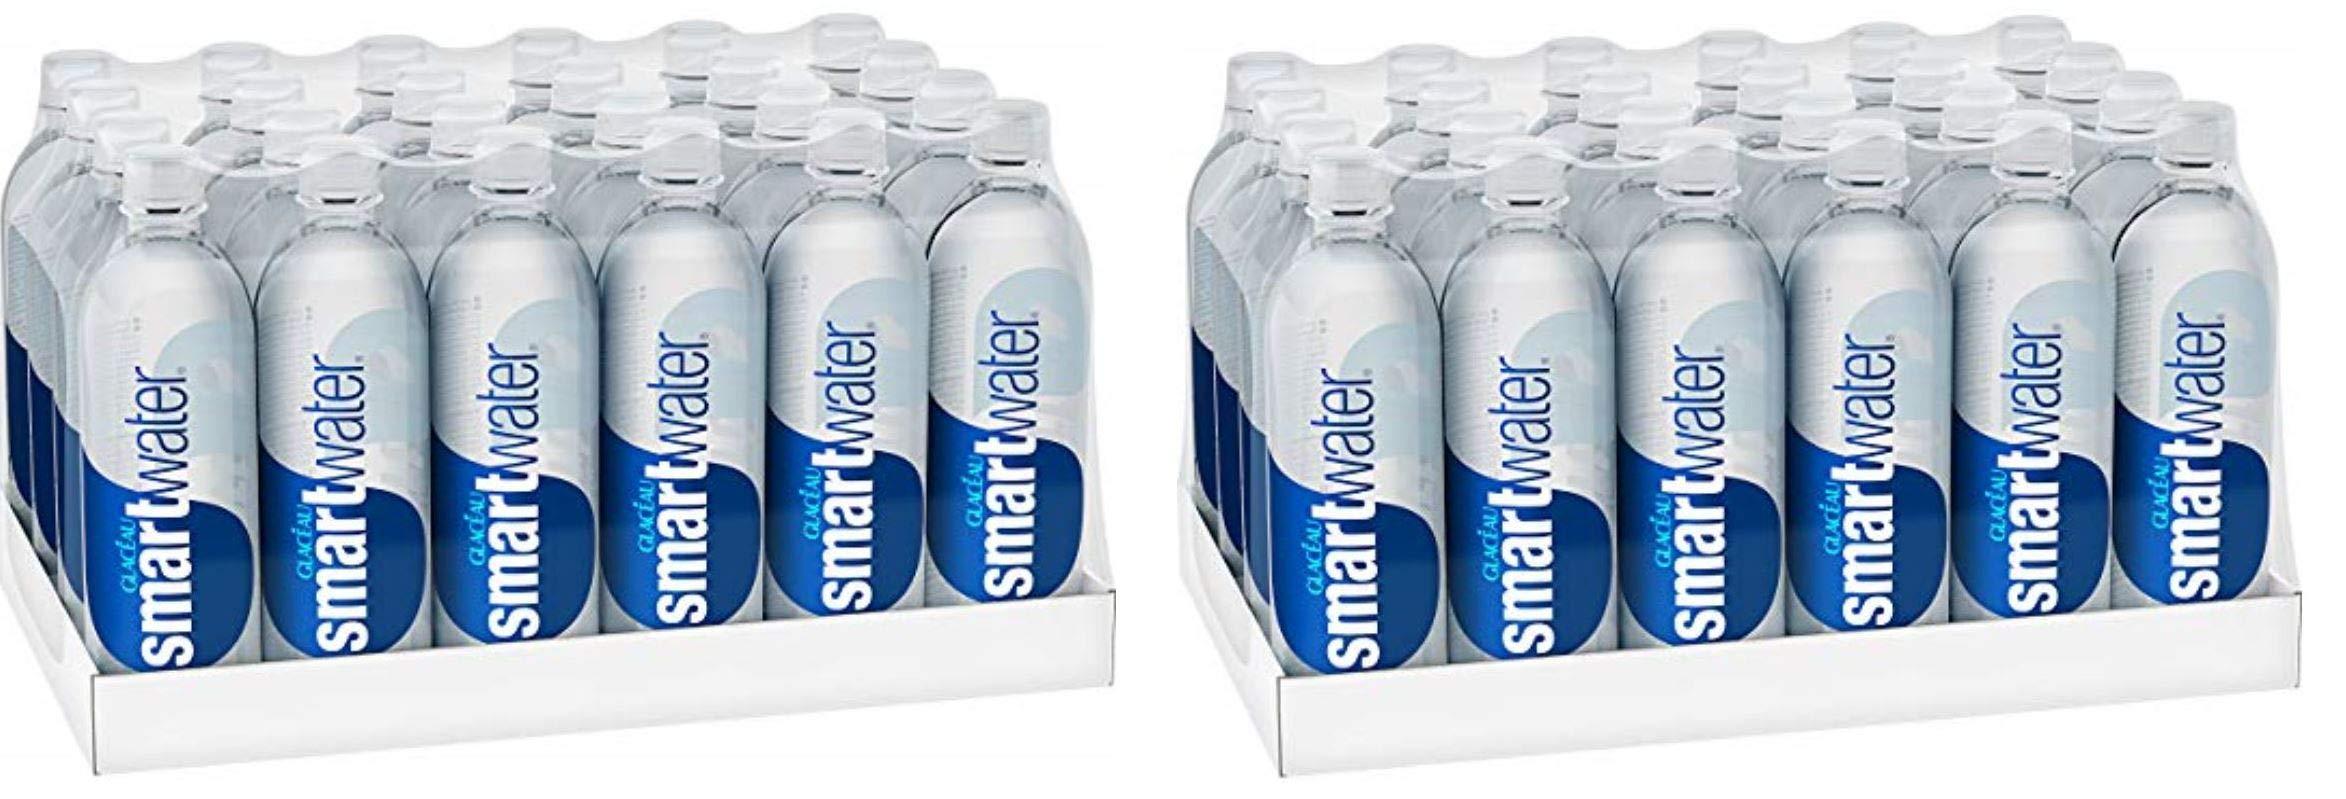 smartwater vapor distilled premium water bottles, 20 fl oz, 24 Pack (2 Cases)